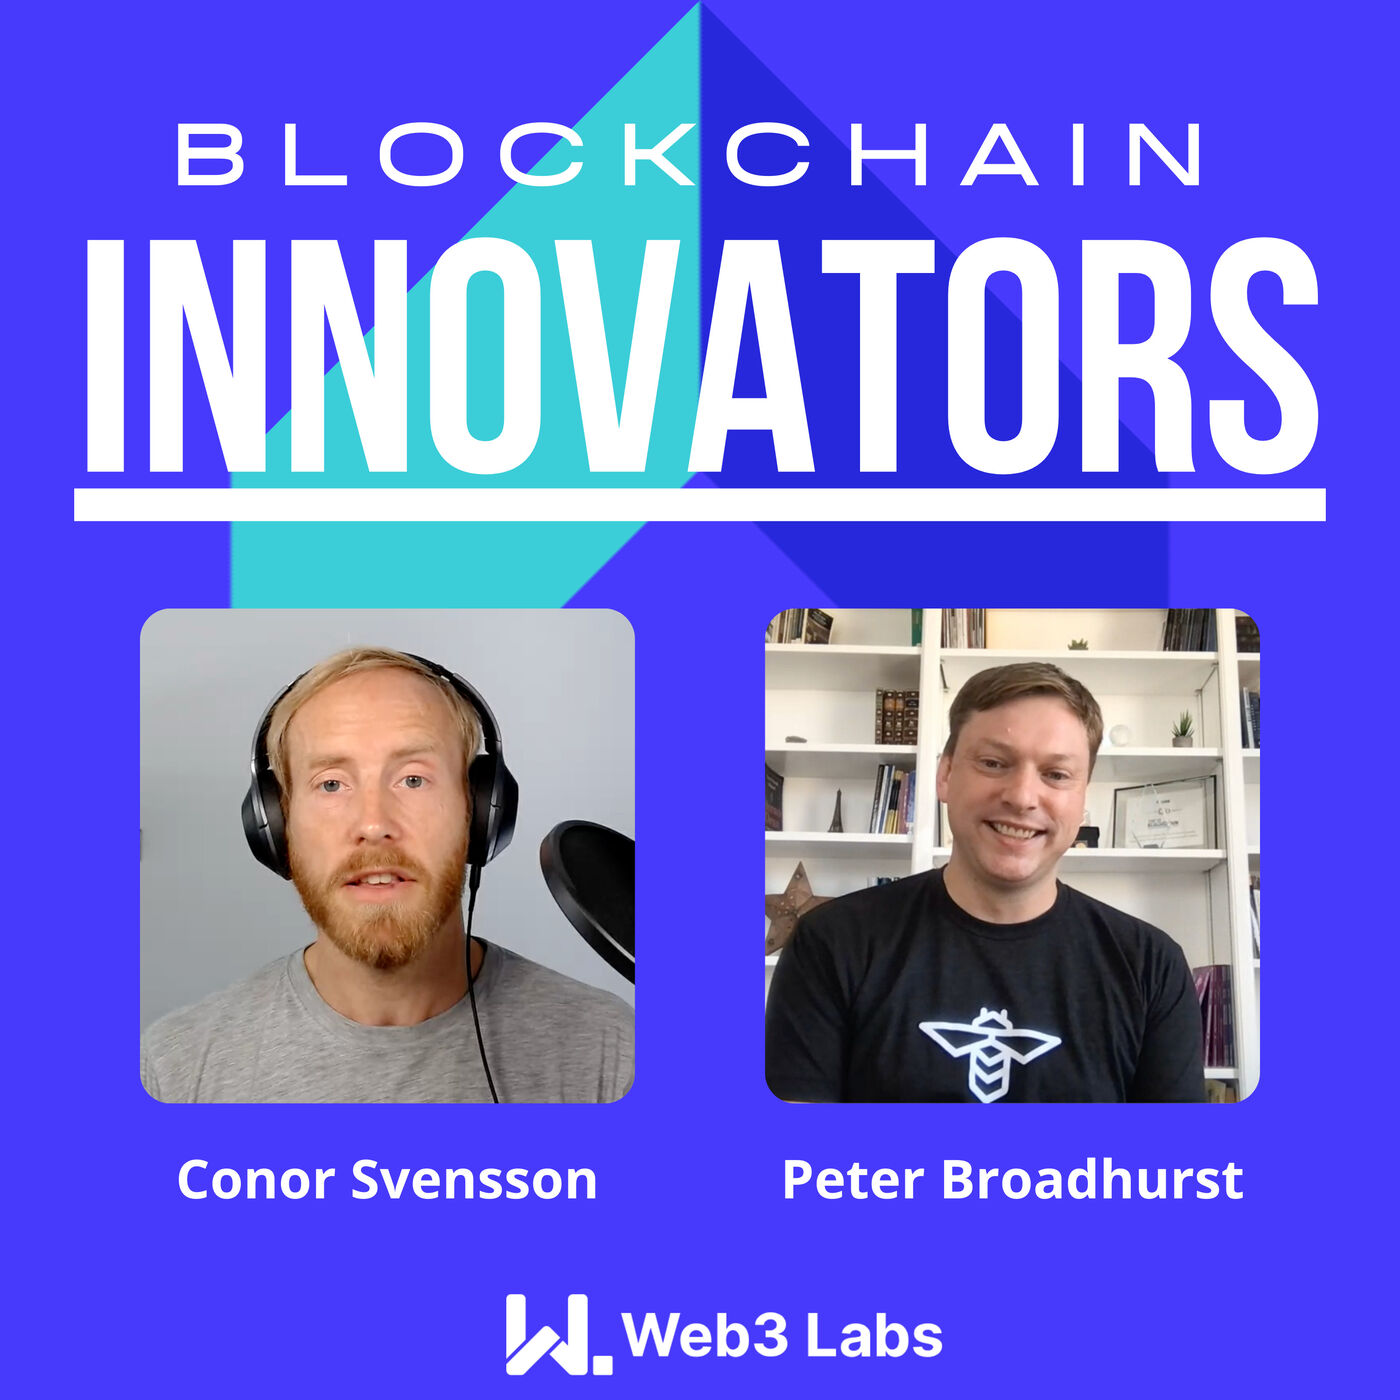 Blockchain Innovators - Conor Svensson and Peter Broadhurst